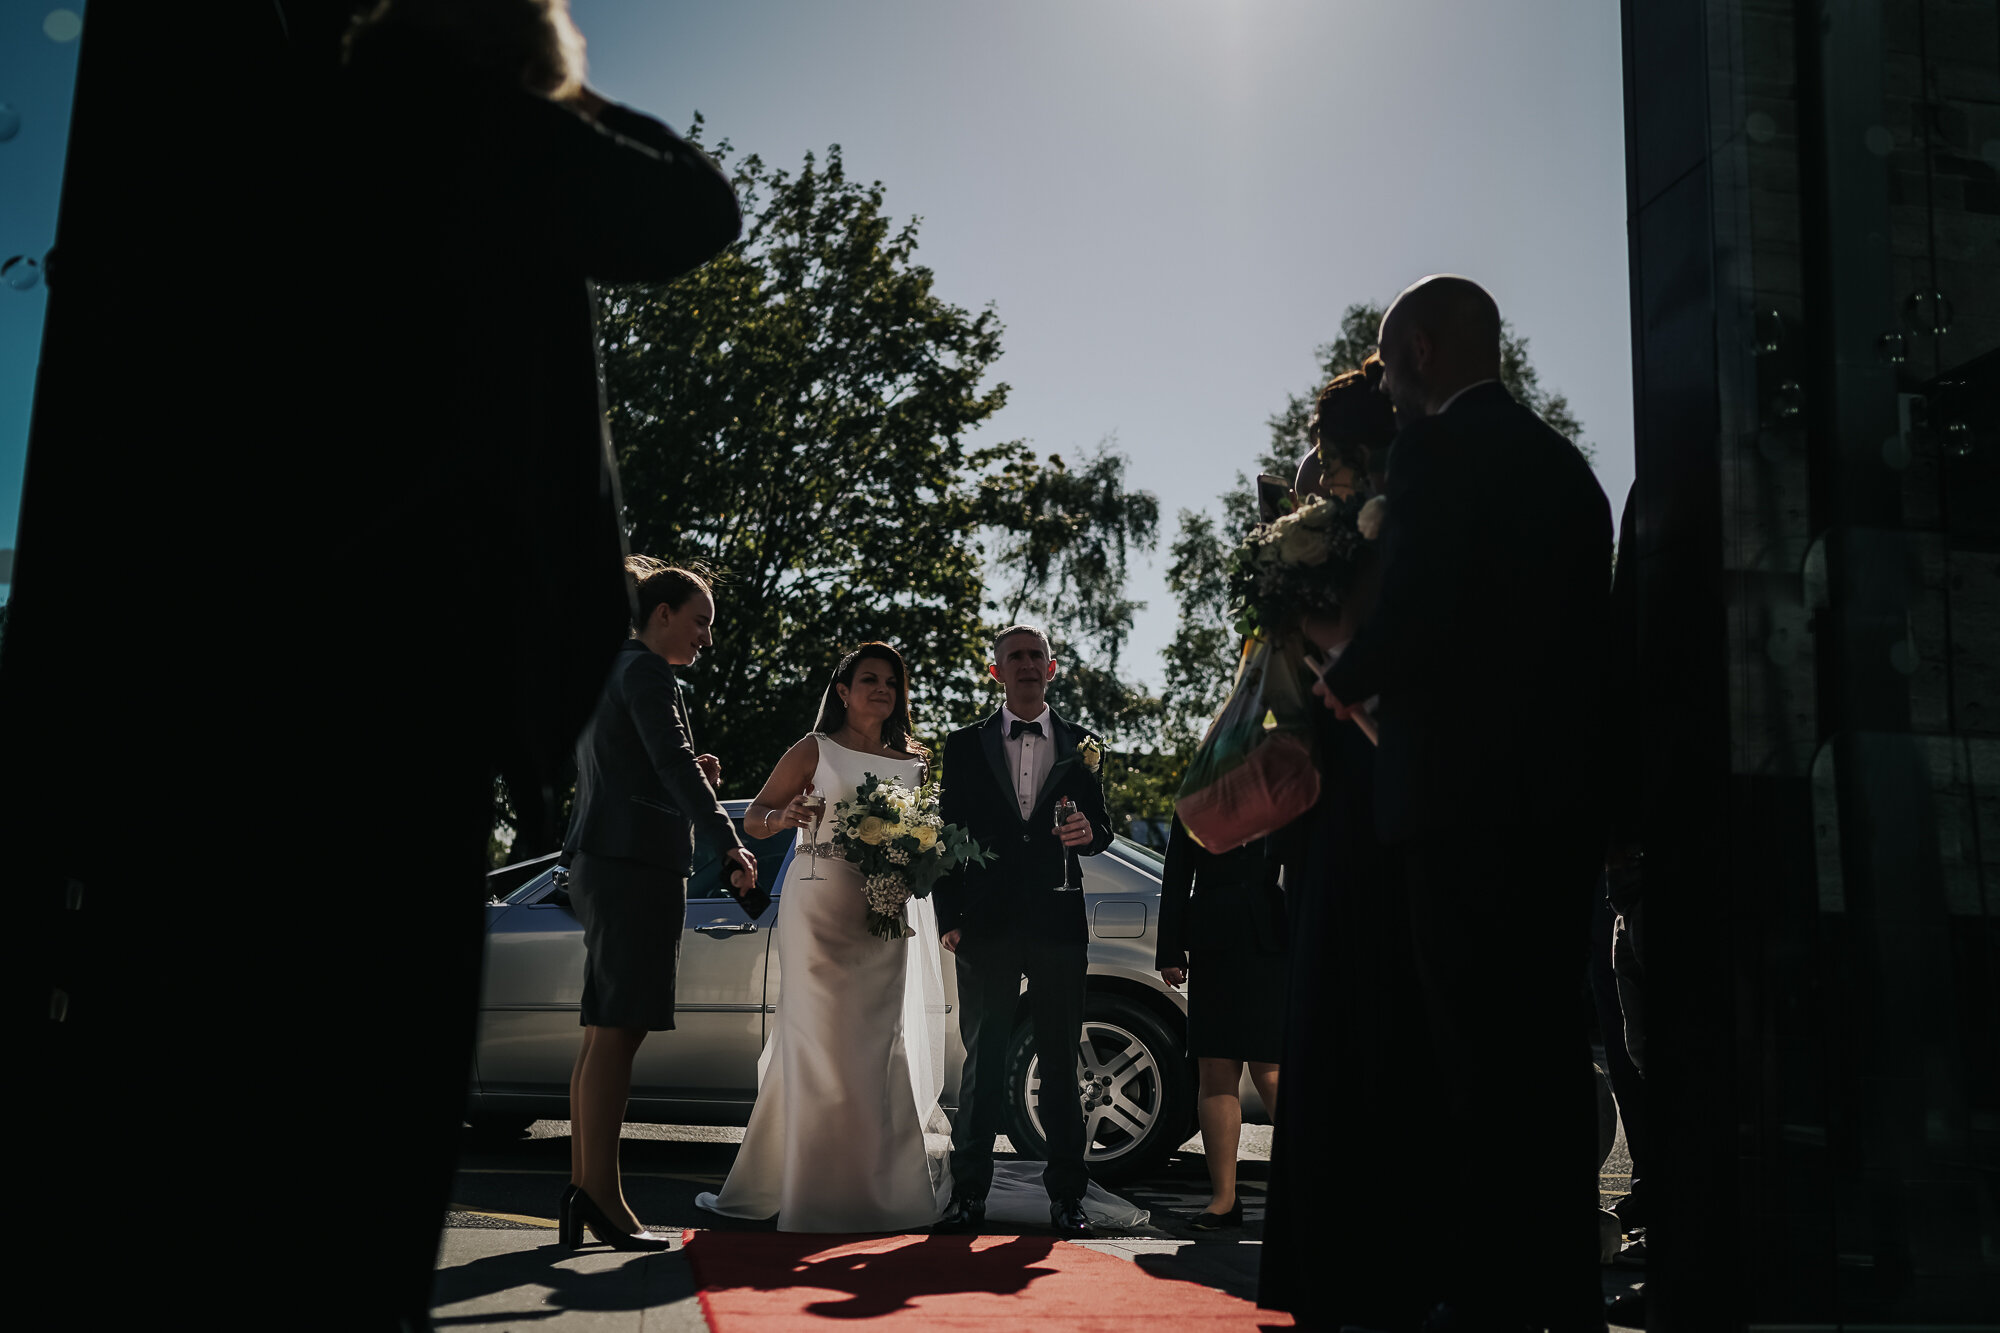 Clontarf Caste wedding photographer Wedding Photography dublin ireland wedding photographer (38 of 58).jpg